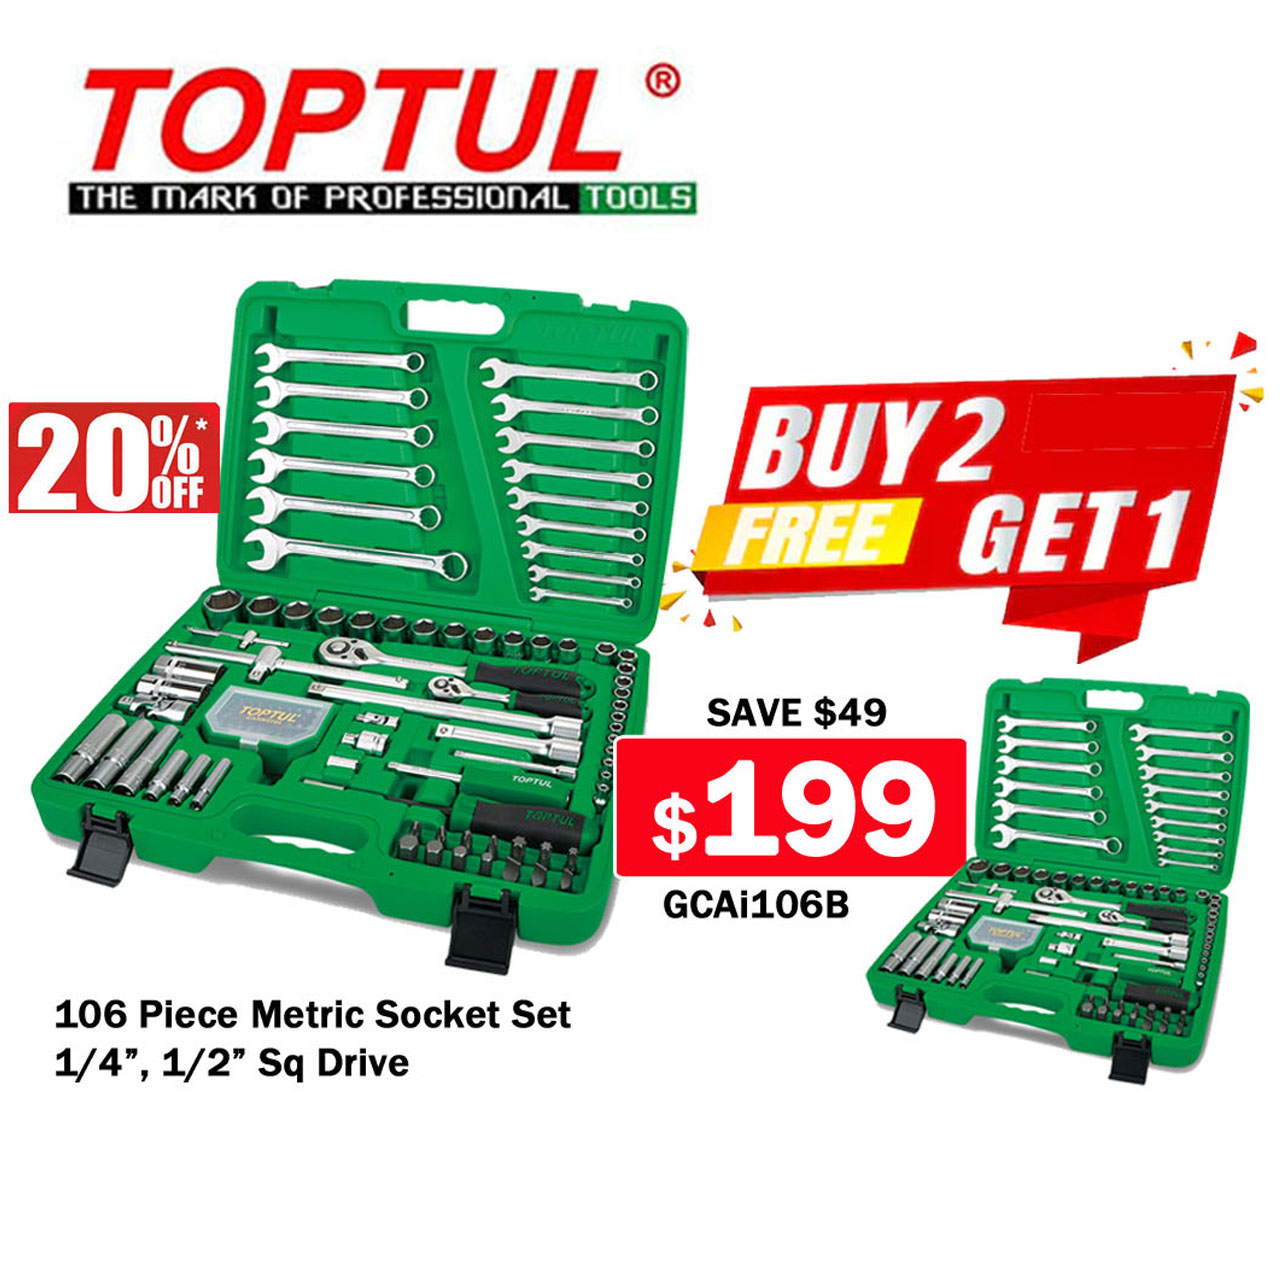 toptul-gcai106b-catalogue-offer.jpg